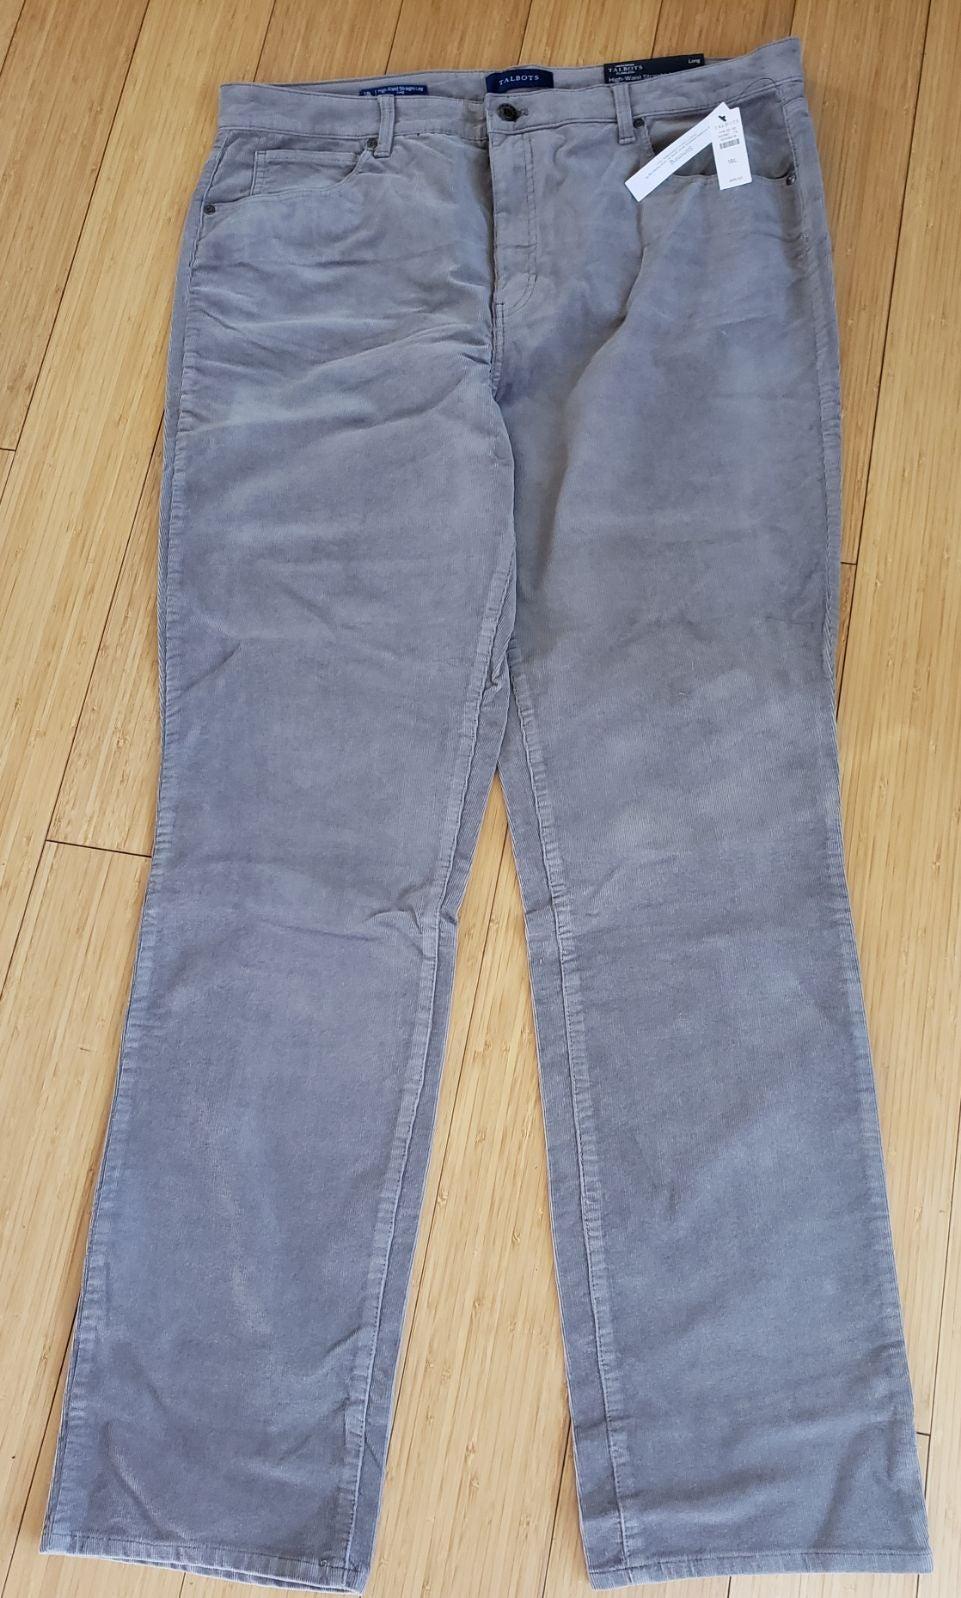 Gray Talbots man's corduroy pants